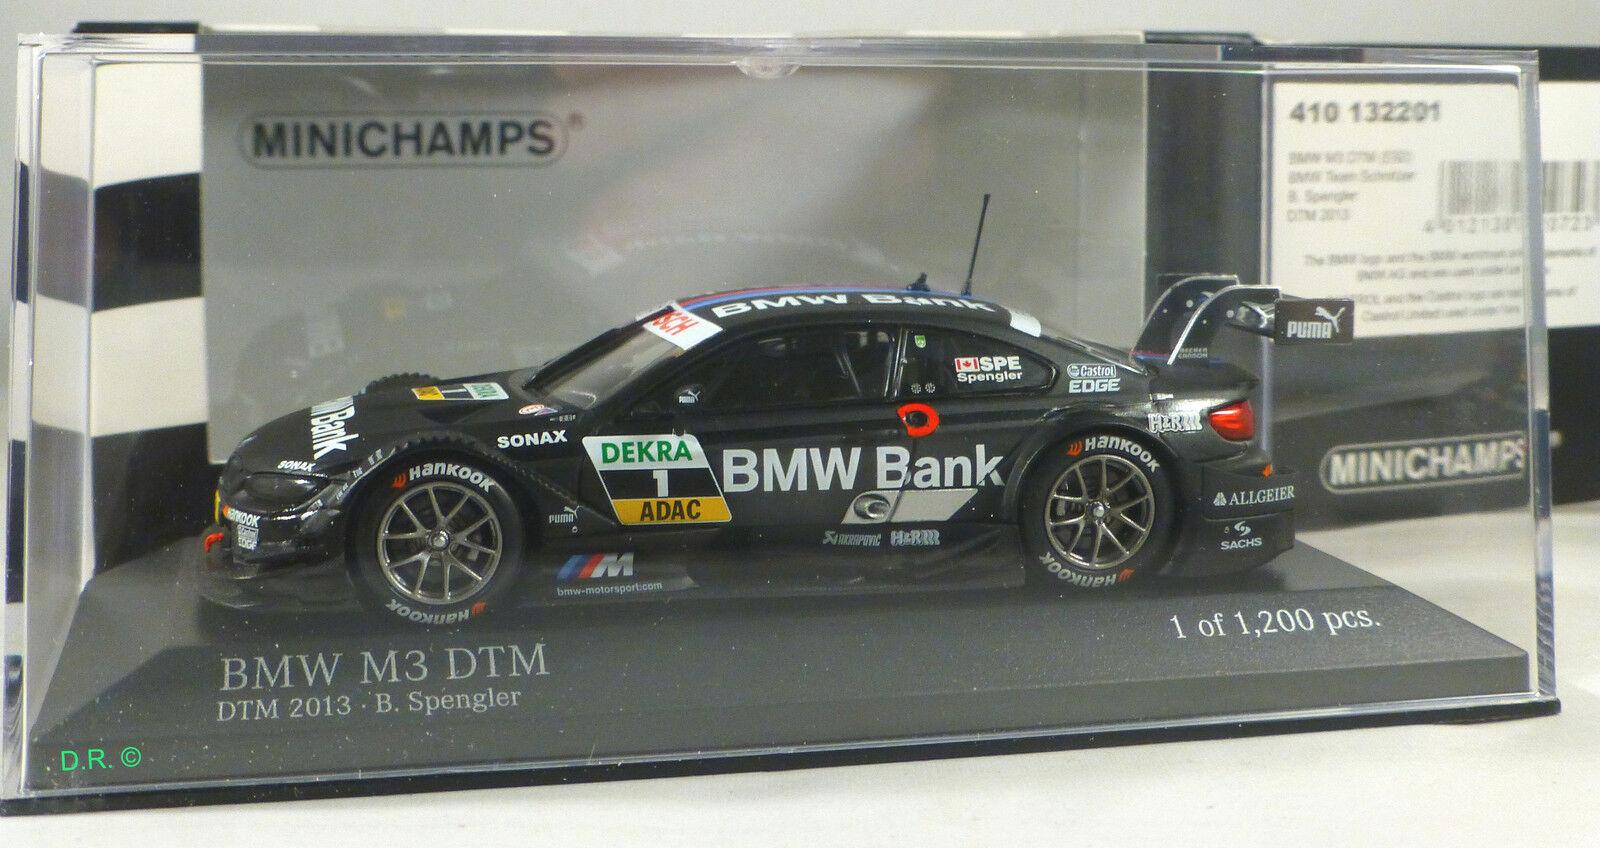 ventas en linea BMW M3 DTM  1 Bruno SPENGLER TEAM TEAM TEAM SCHNITZER DTM 2013 ltd 1,200 MINICHAMPS 1 43  promociones